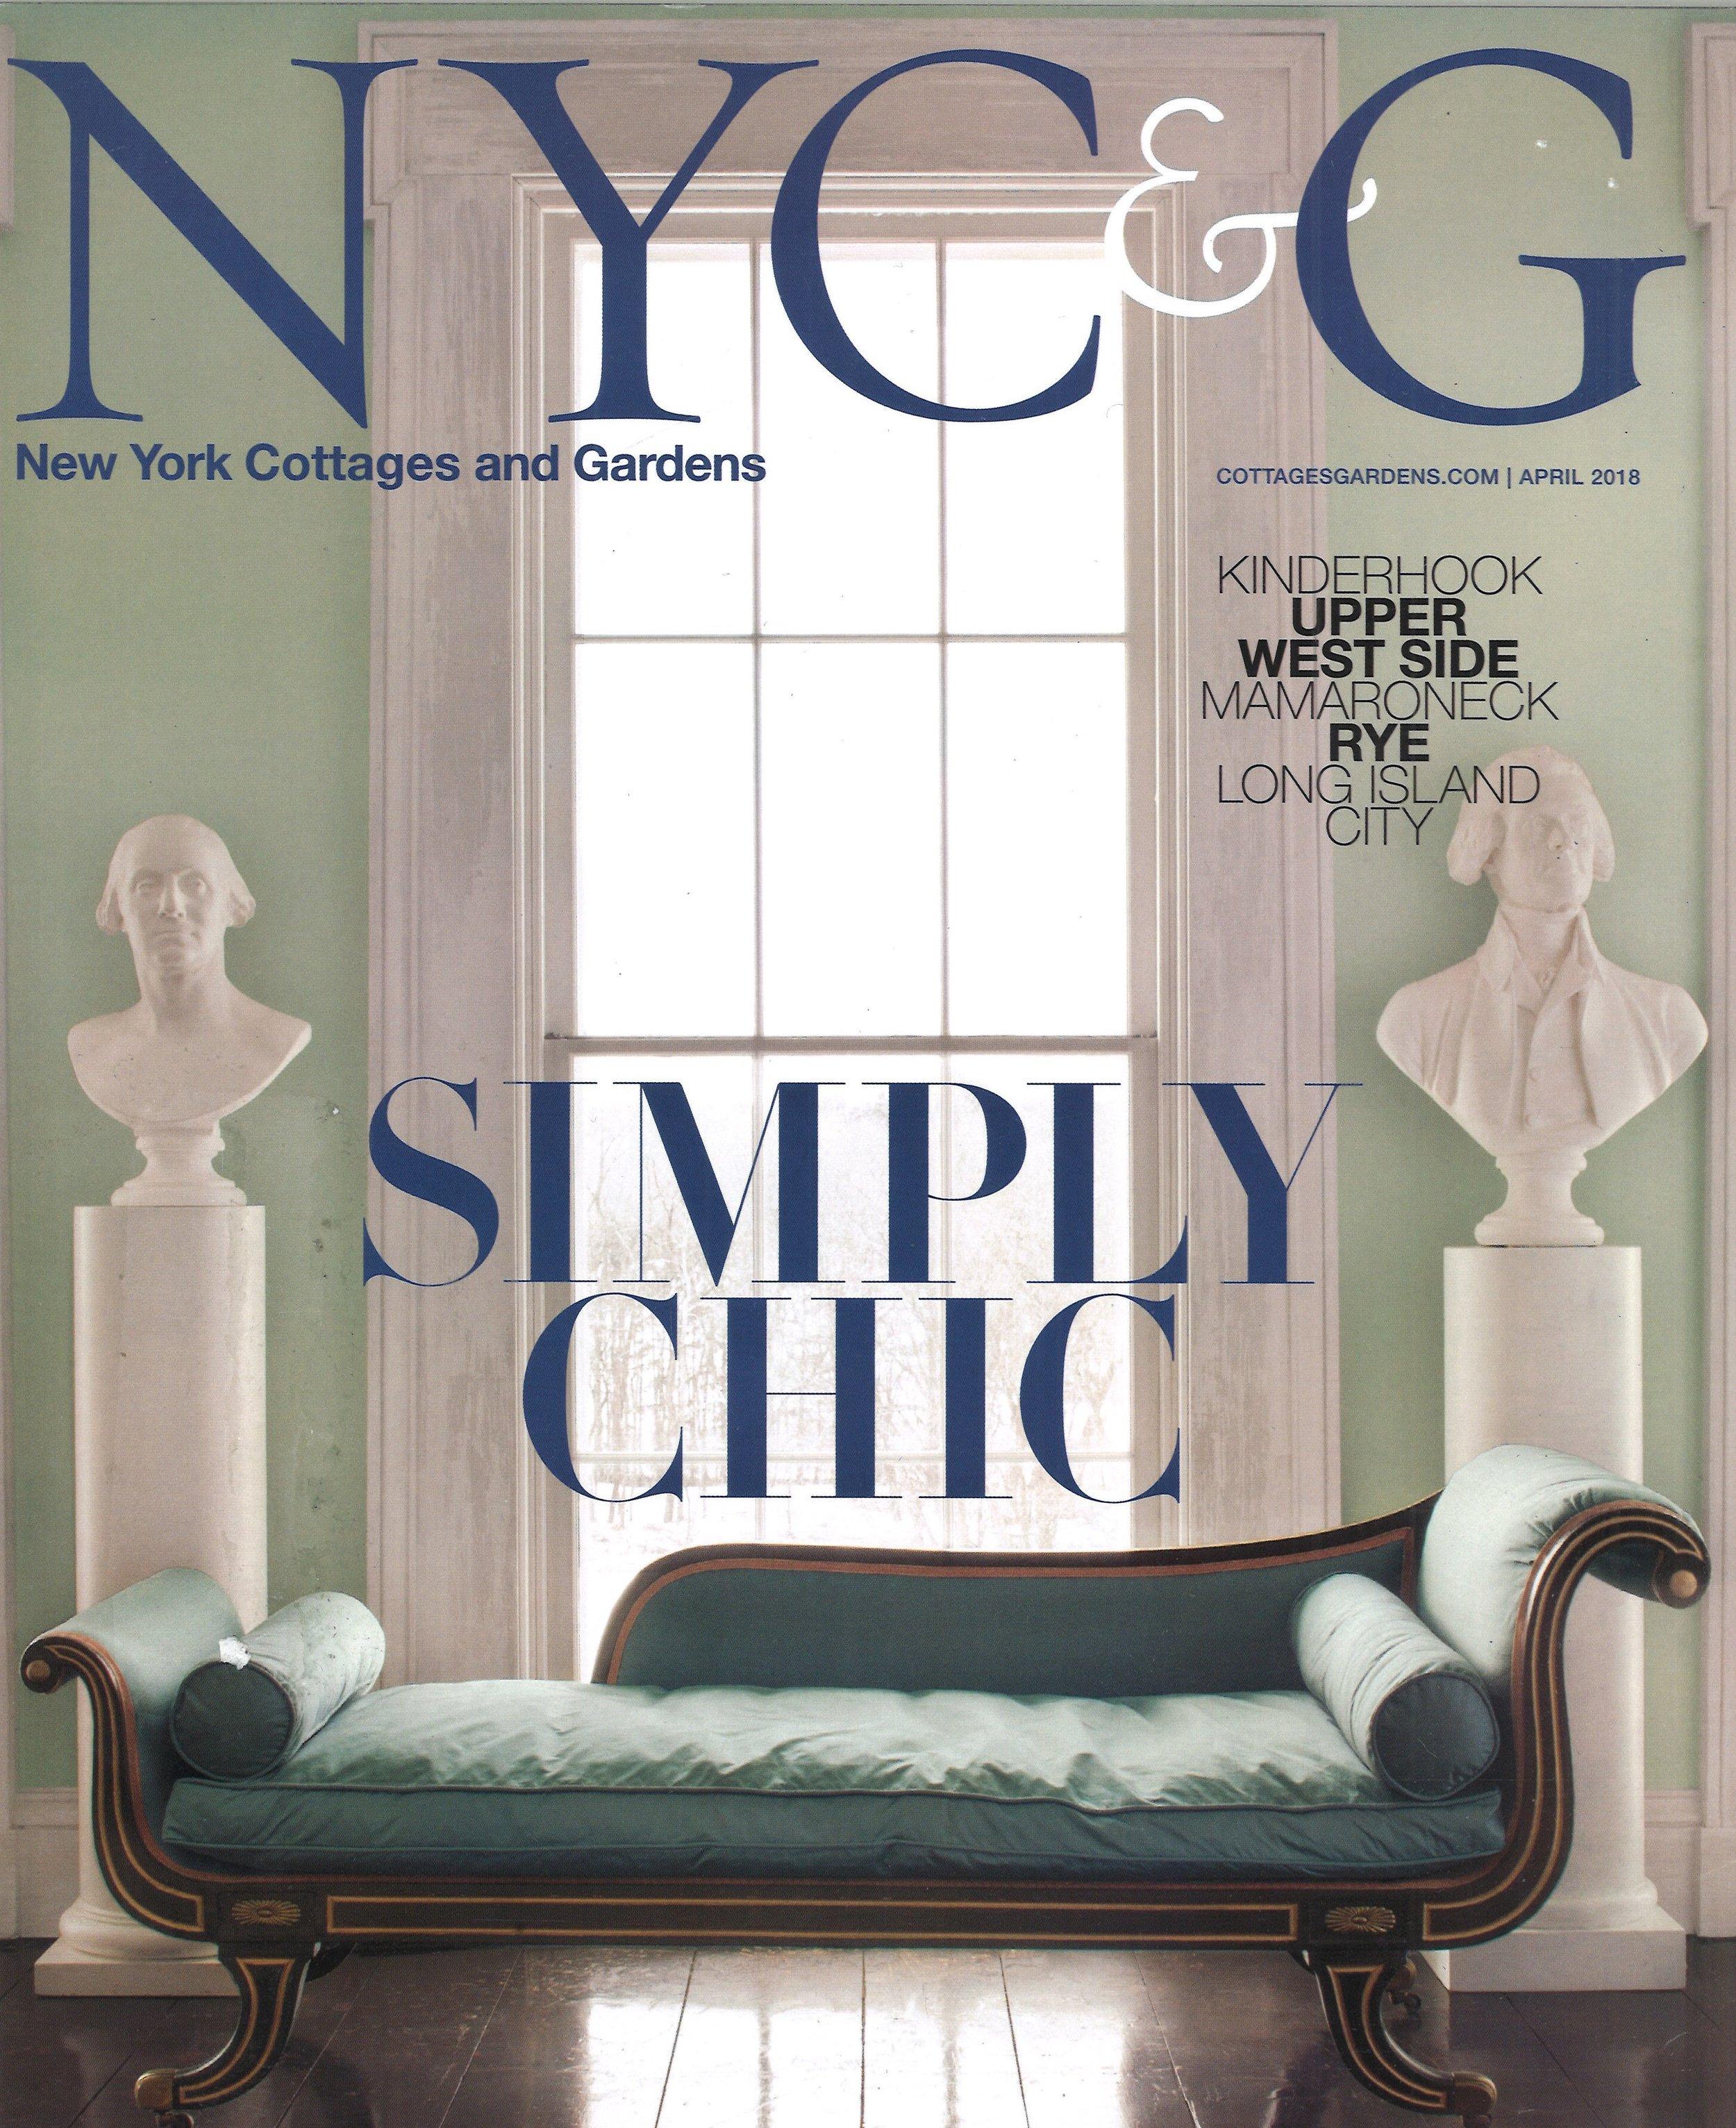 NYCG april18 cover.jpg